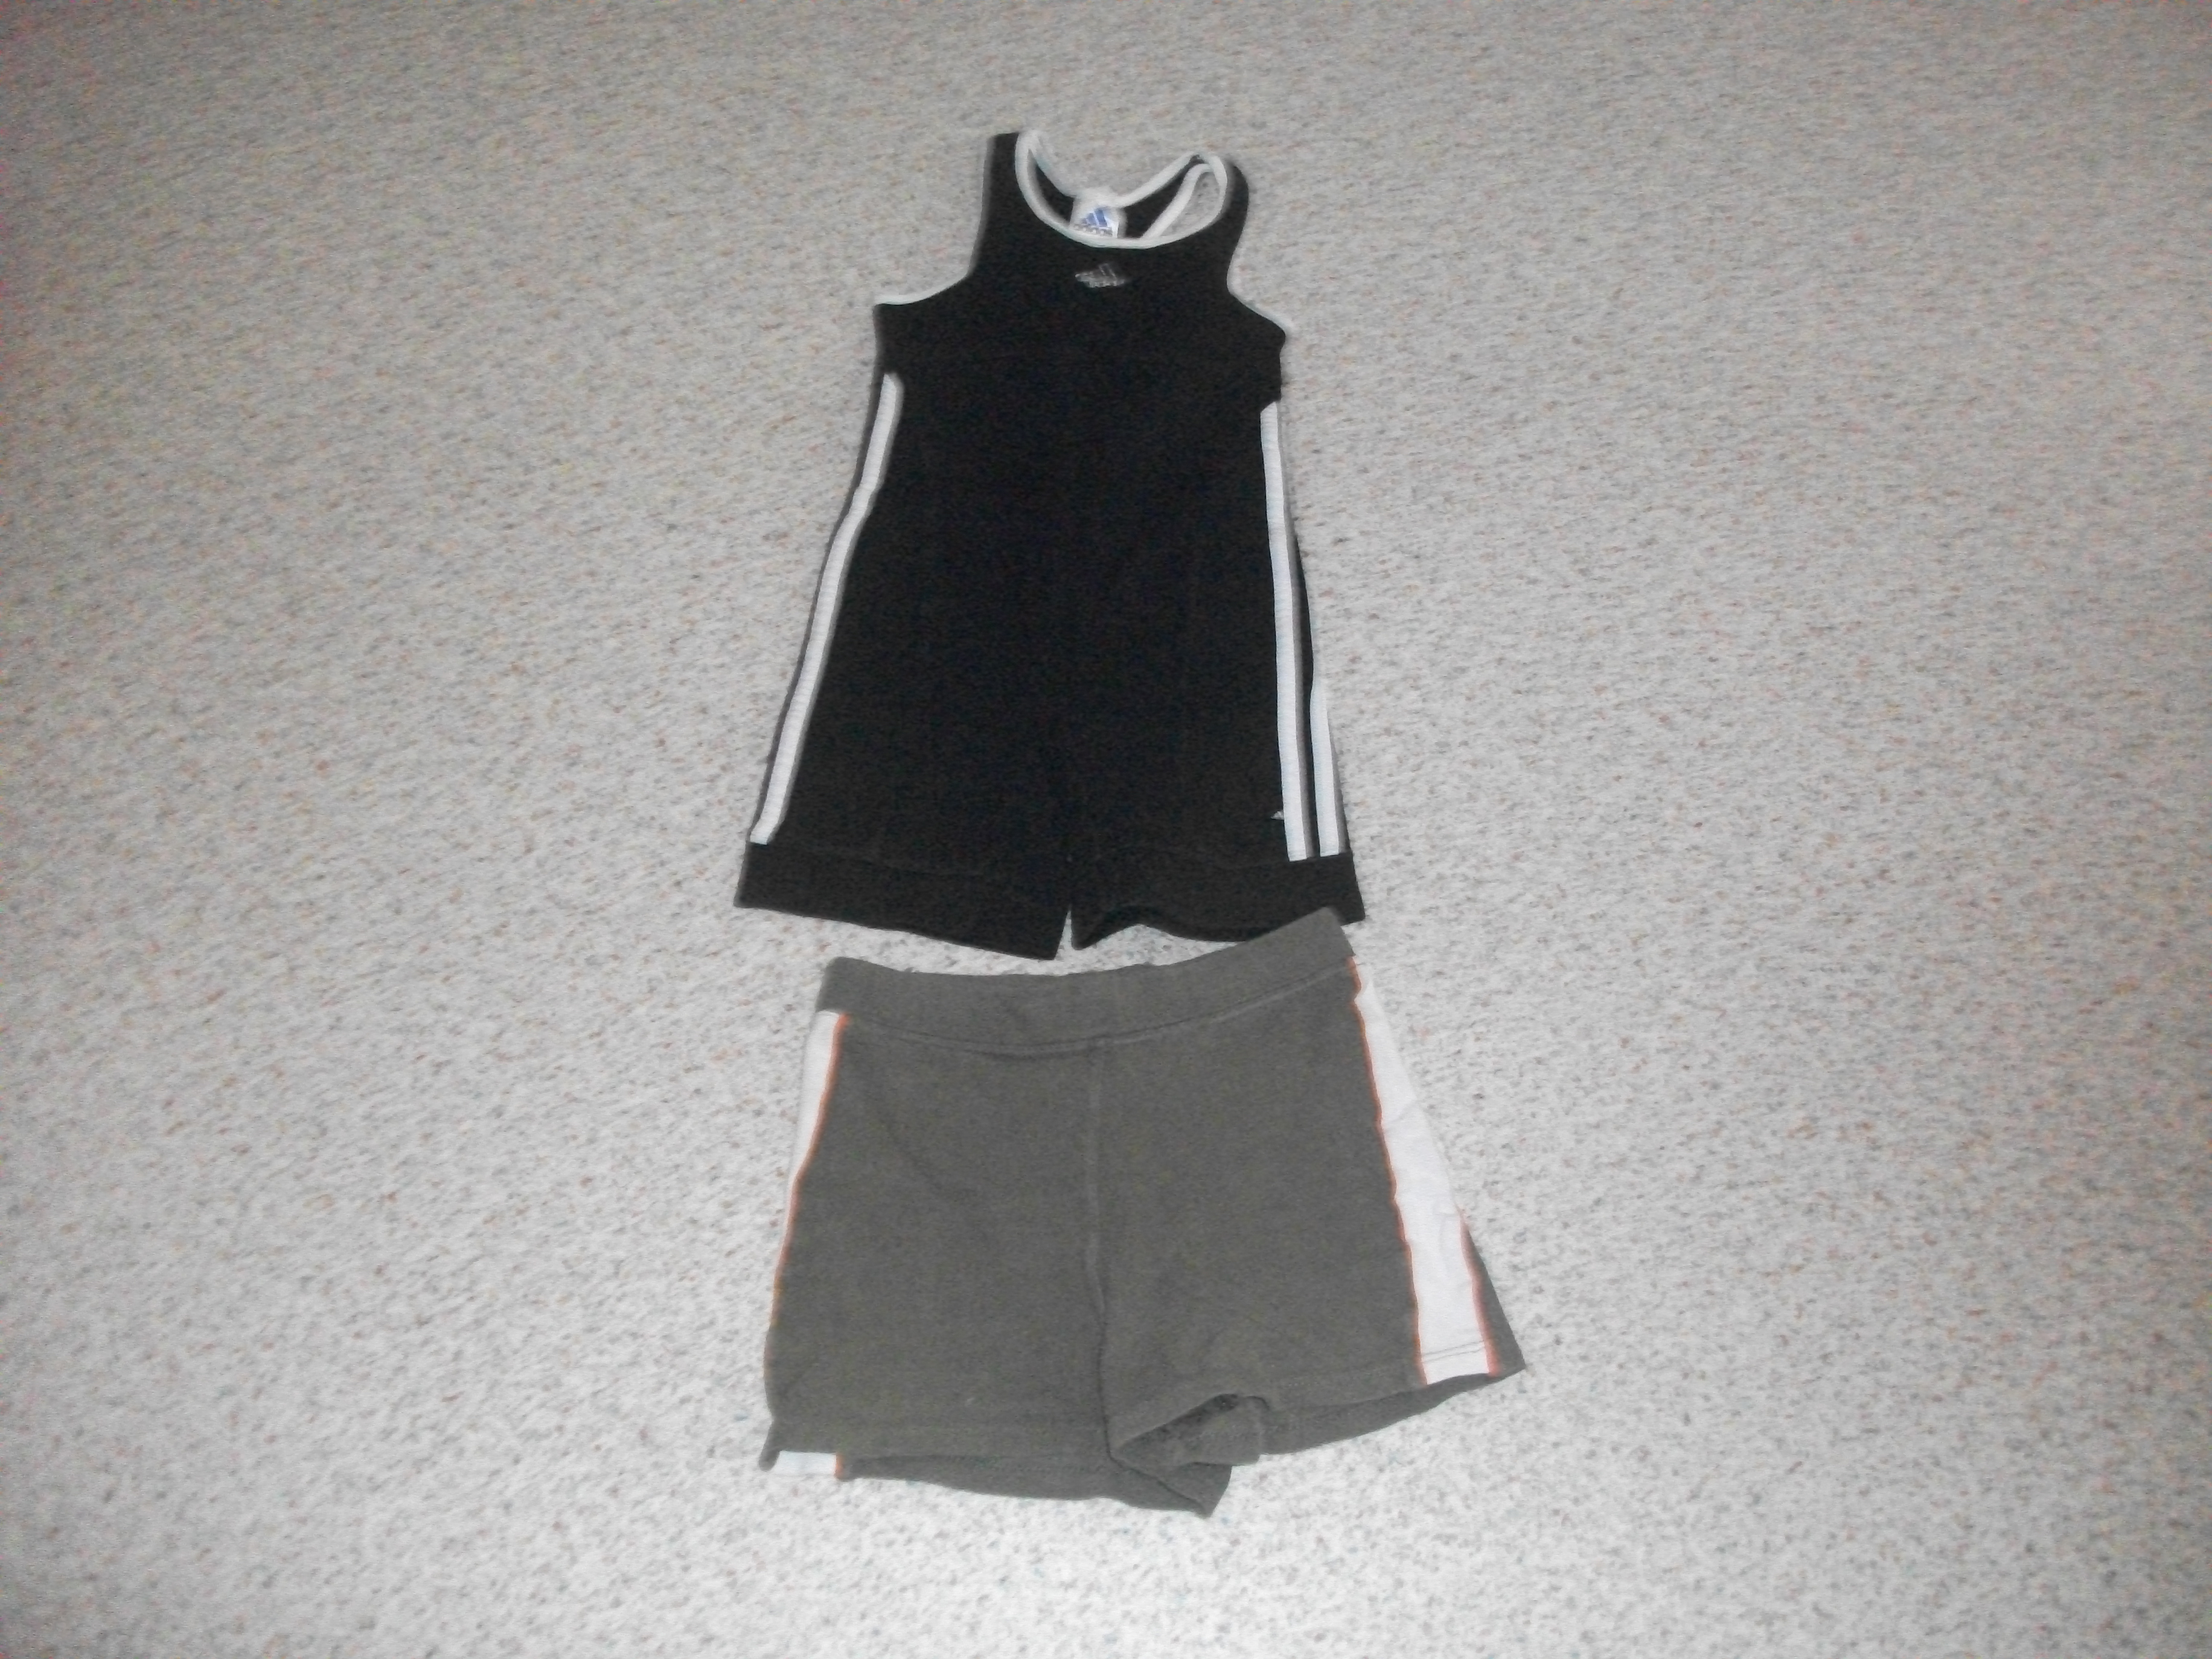 Lot de Vêtements Fille Sport -1 Short Vert Rocky + 1 Body corps ... 5fae2419648